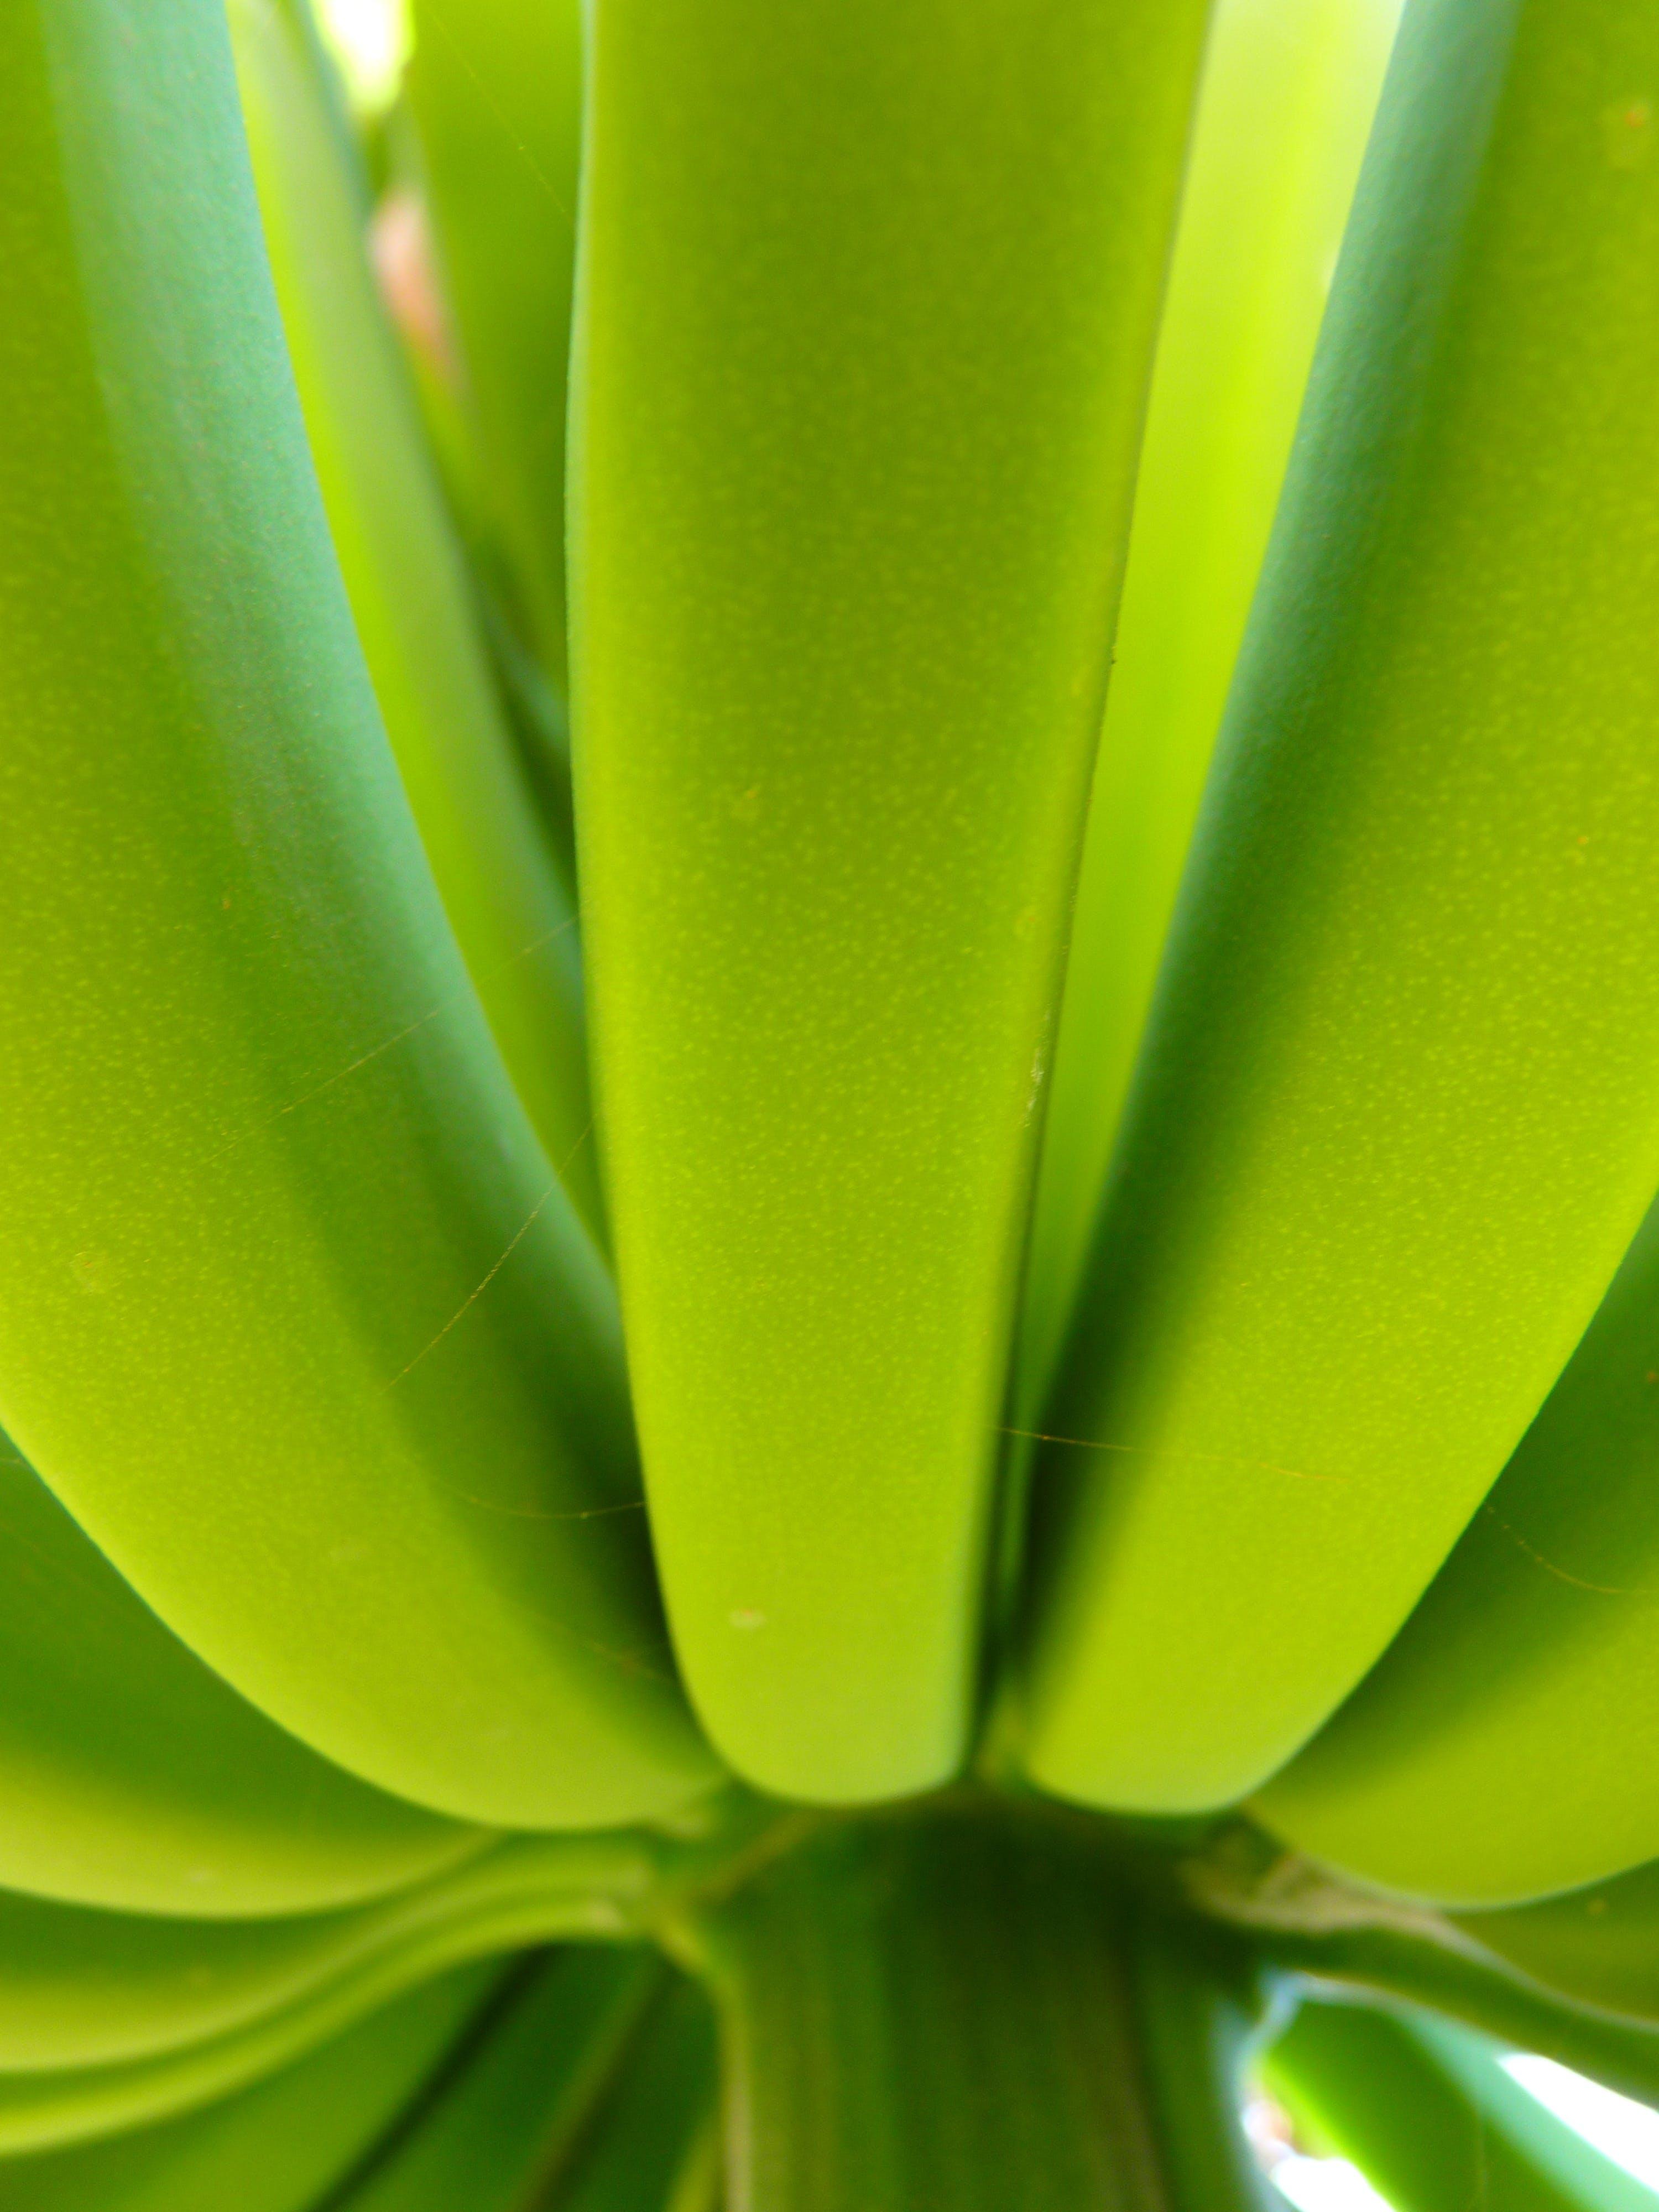 Free stock photo of food, plant, green, banana